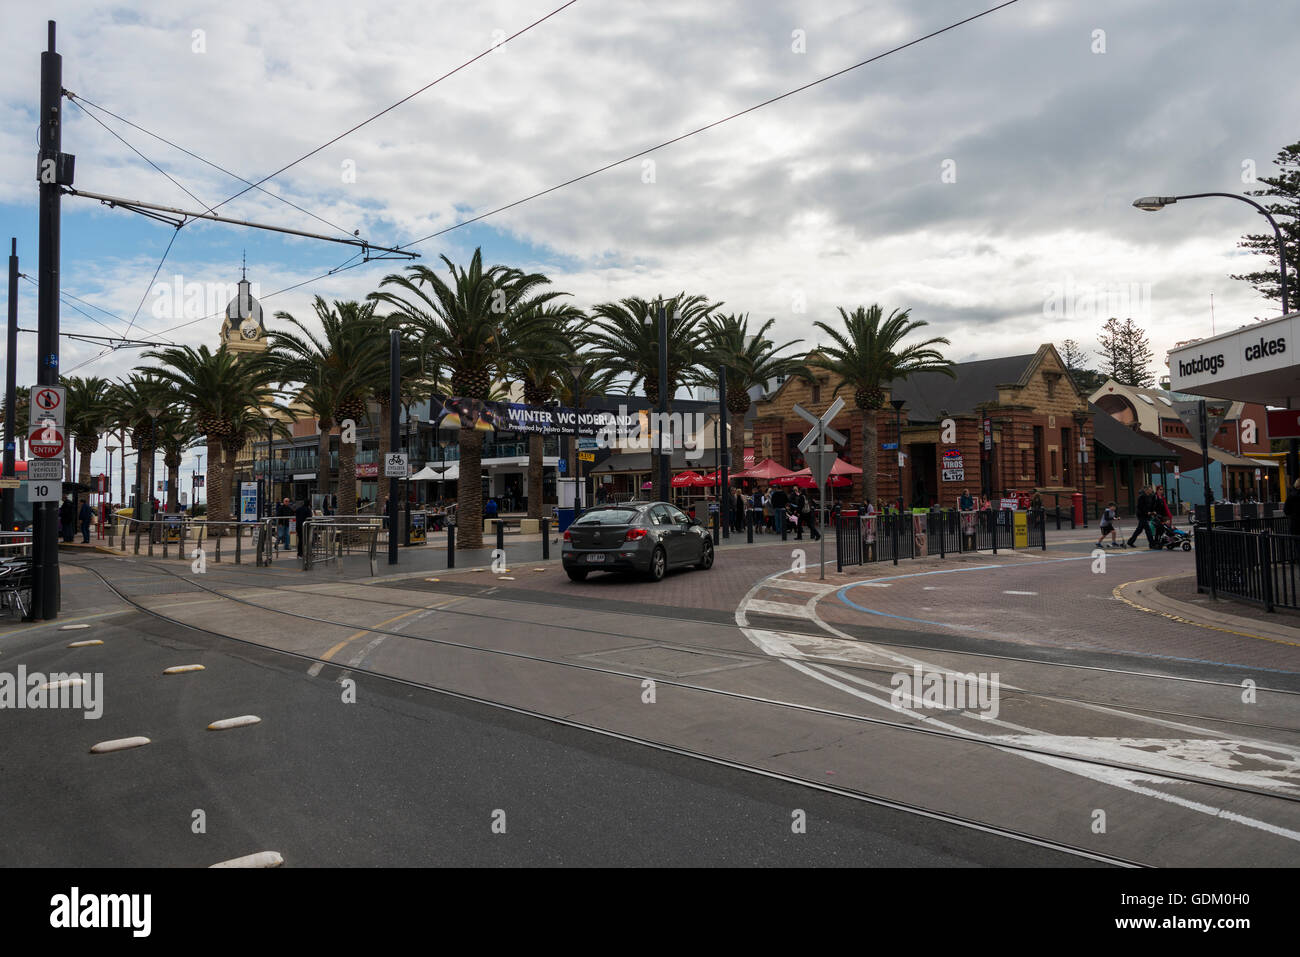 Moseley Square, Glenelg, Adelaide, South Australia Stock Photo